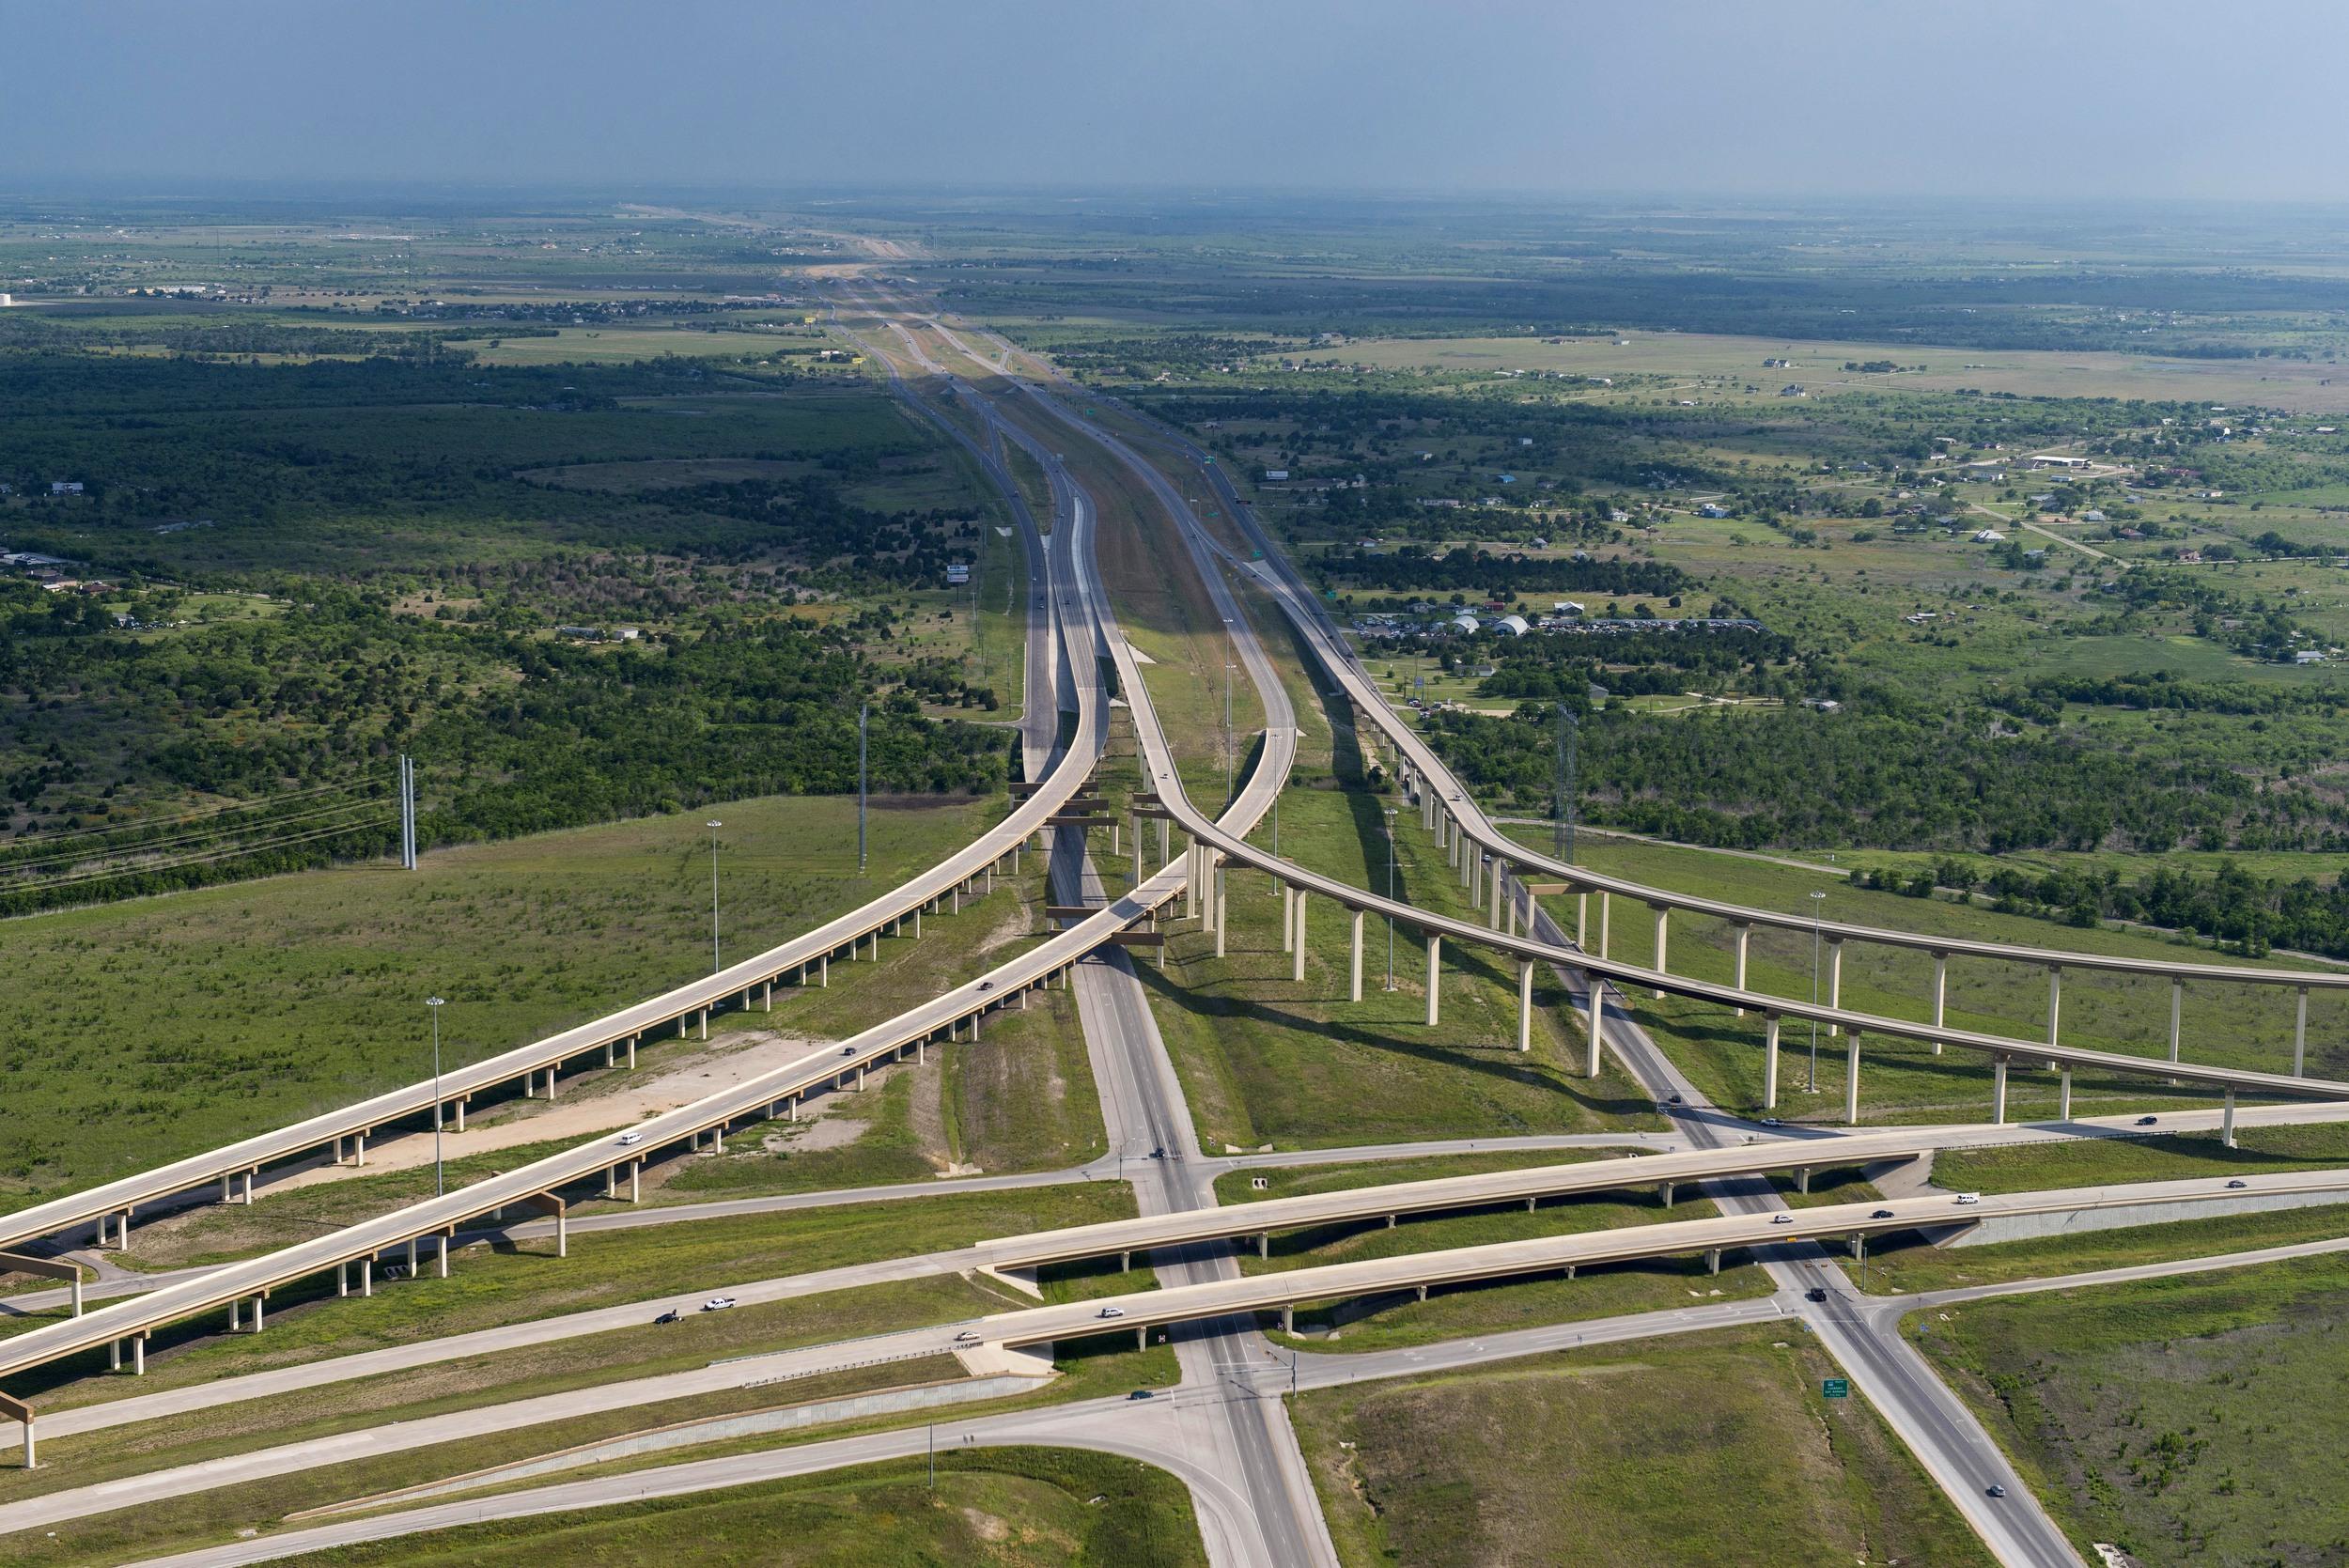 Texas_HWY_130_Toll_Road_201305_1.jpg